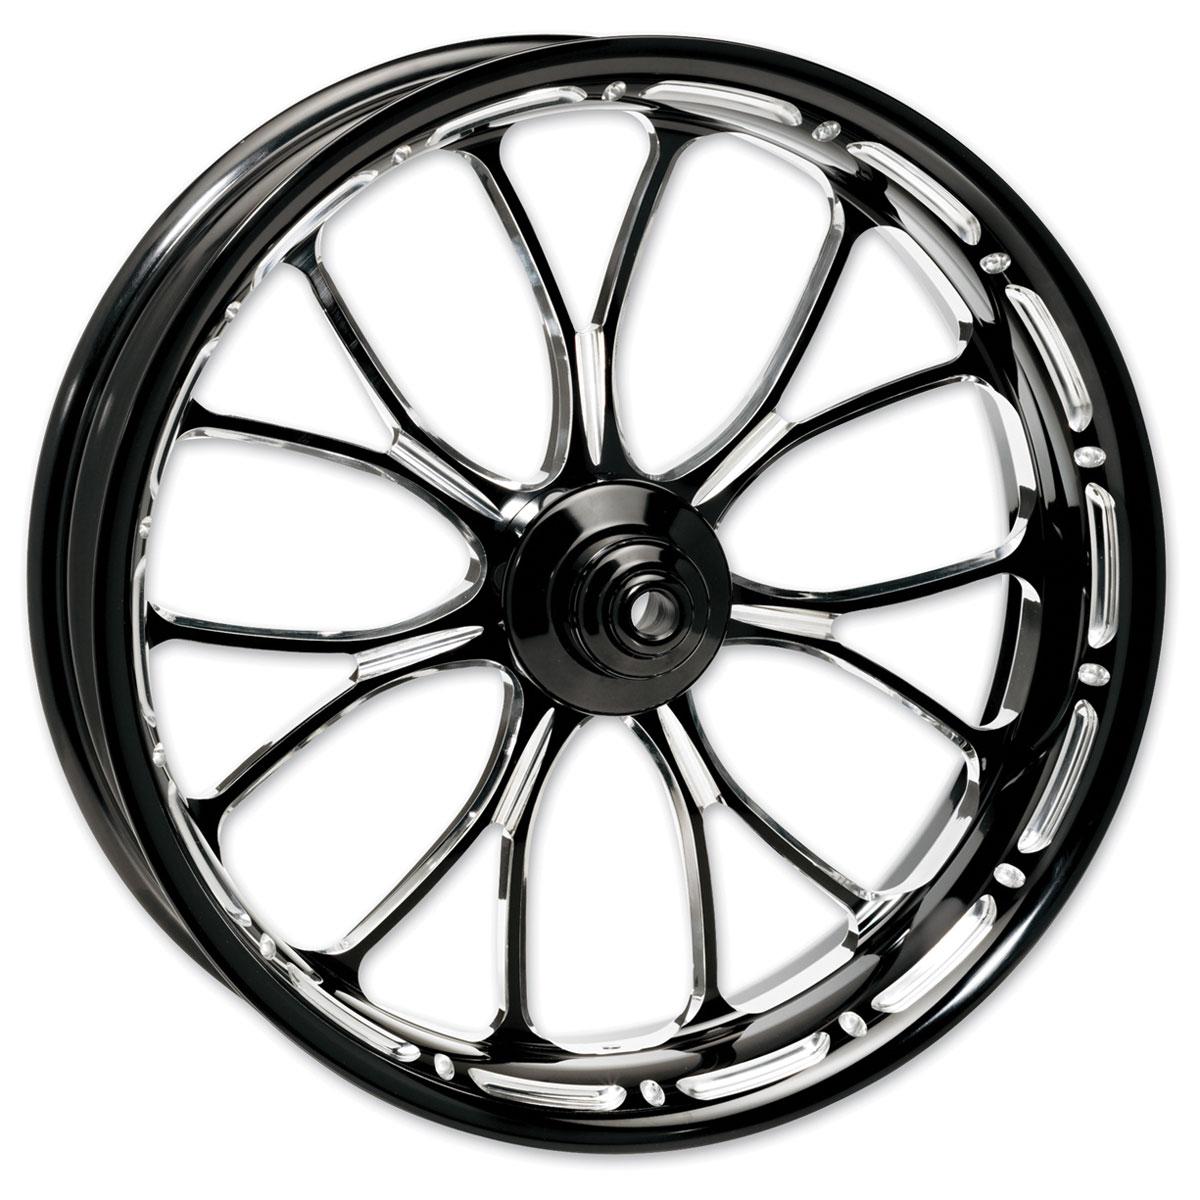 Performance Machine Heathen Platinum Cut Front Wheel 23x3.5 Non-ABS Single Disc